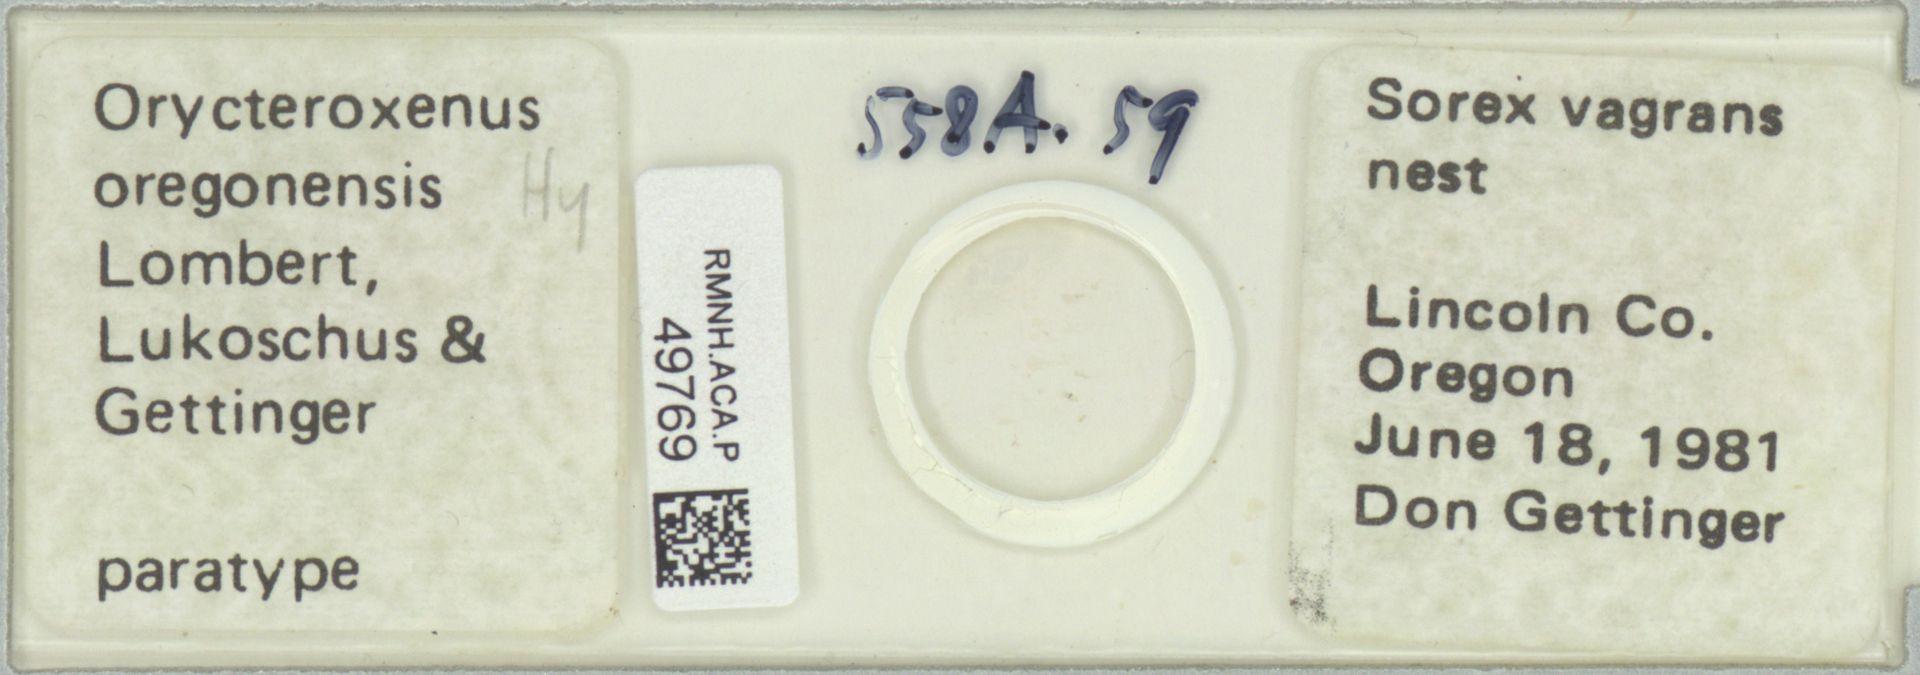 RMNH.ACA.P.49769   Orycteroxenus oregonensis Lombert, Lukoschus & Gettinger